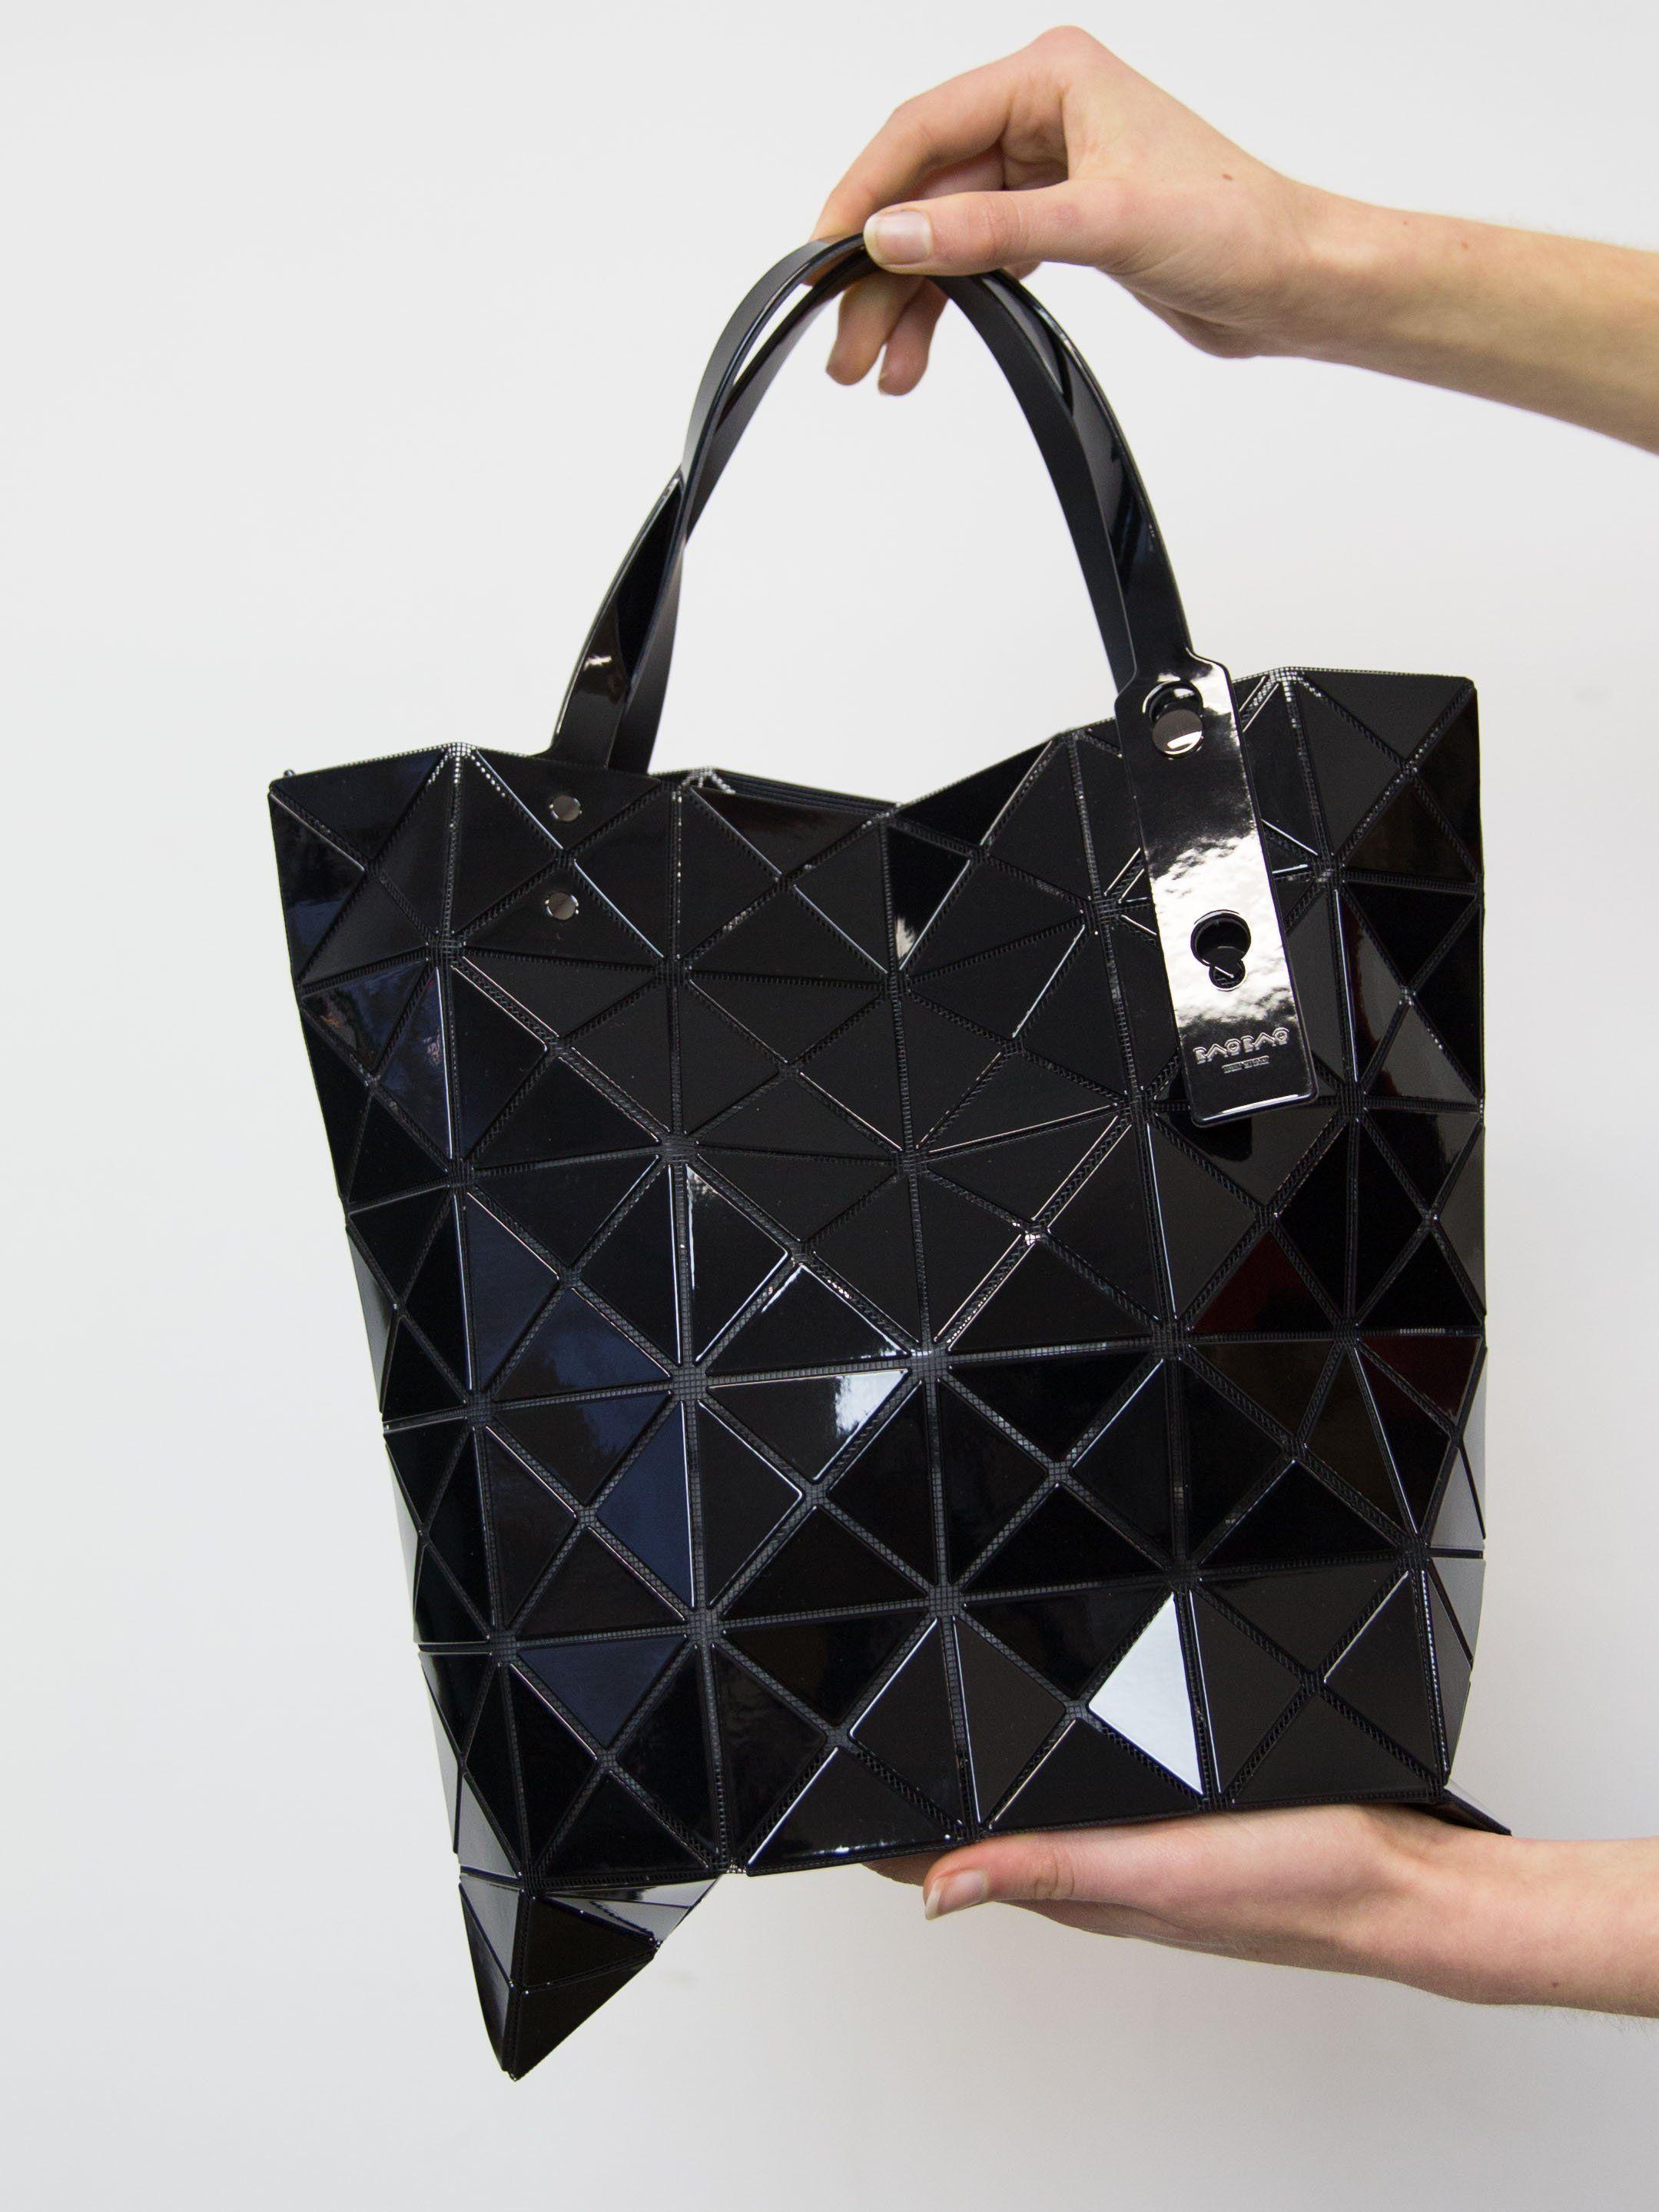 0d953d0111e7 BAO BAO ISSEY MIYAKE Lucent Tote Bag